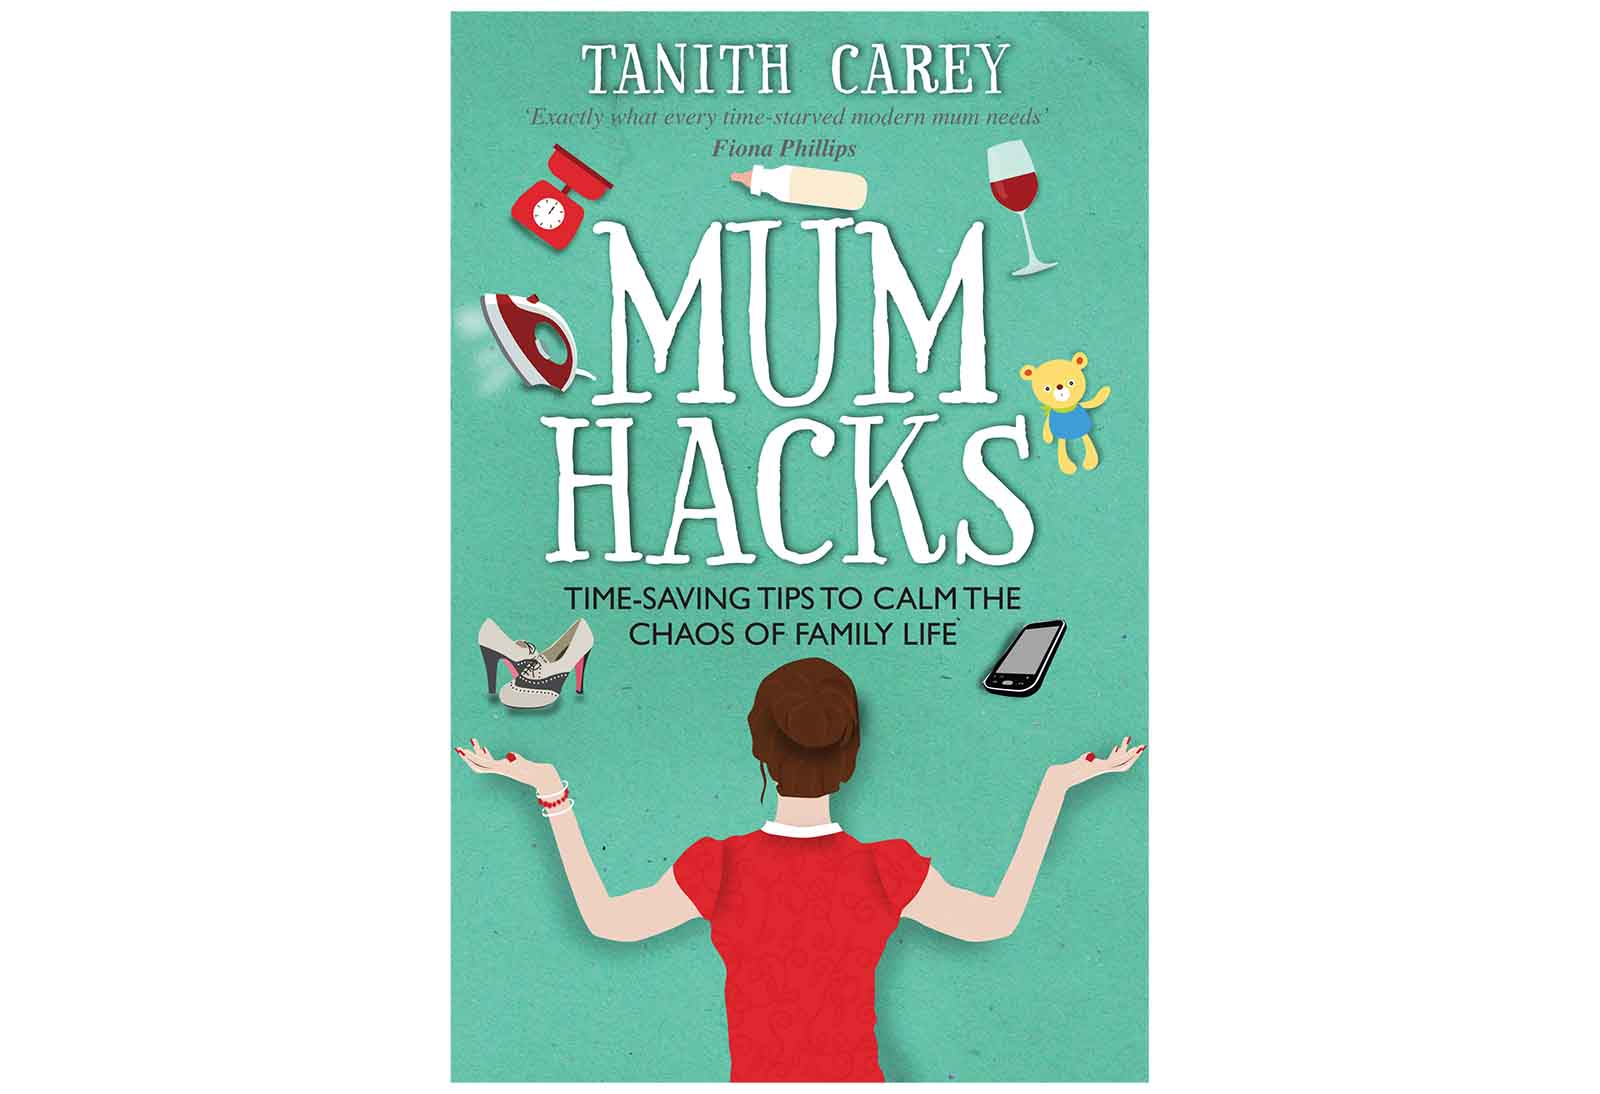 mum-hacks-front-cover-final